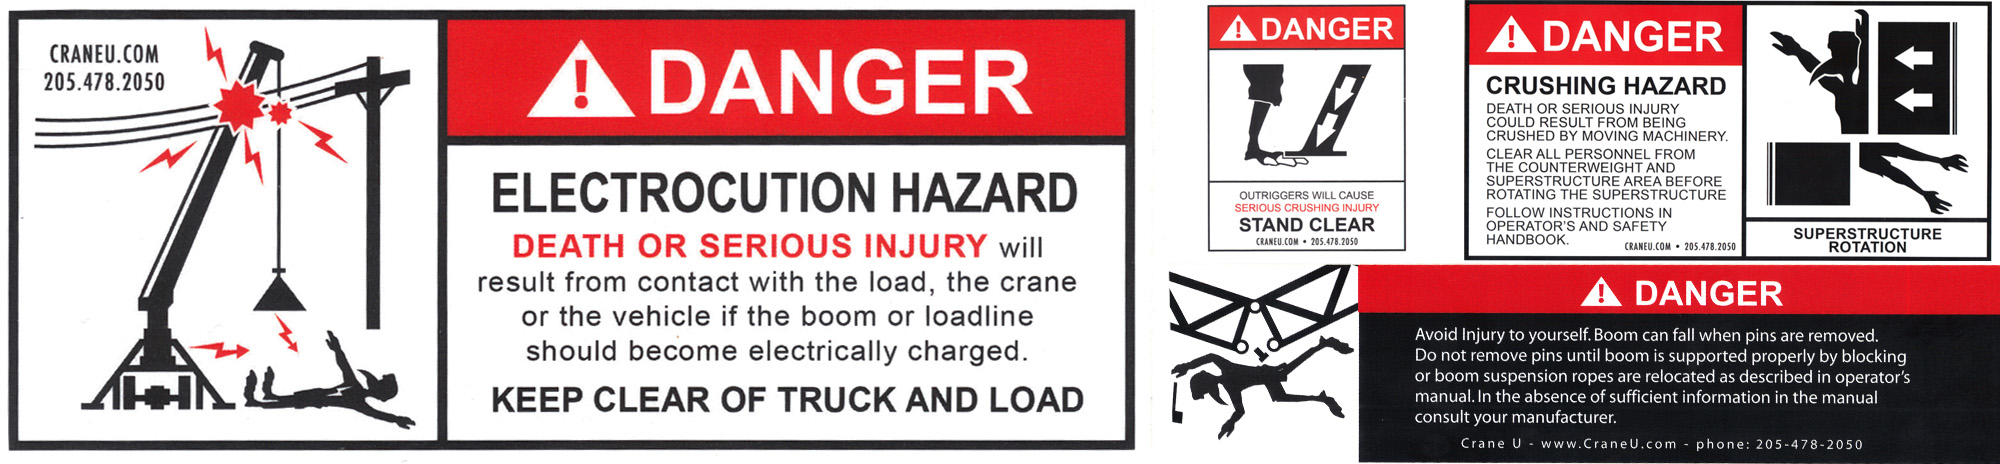 safety sticker for cranes